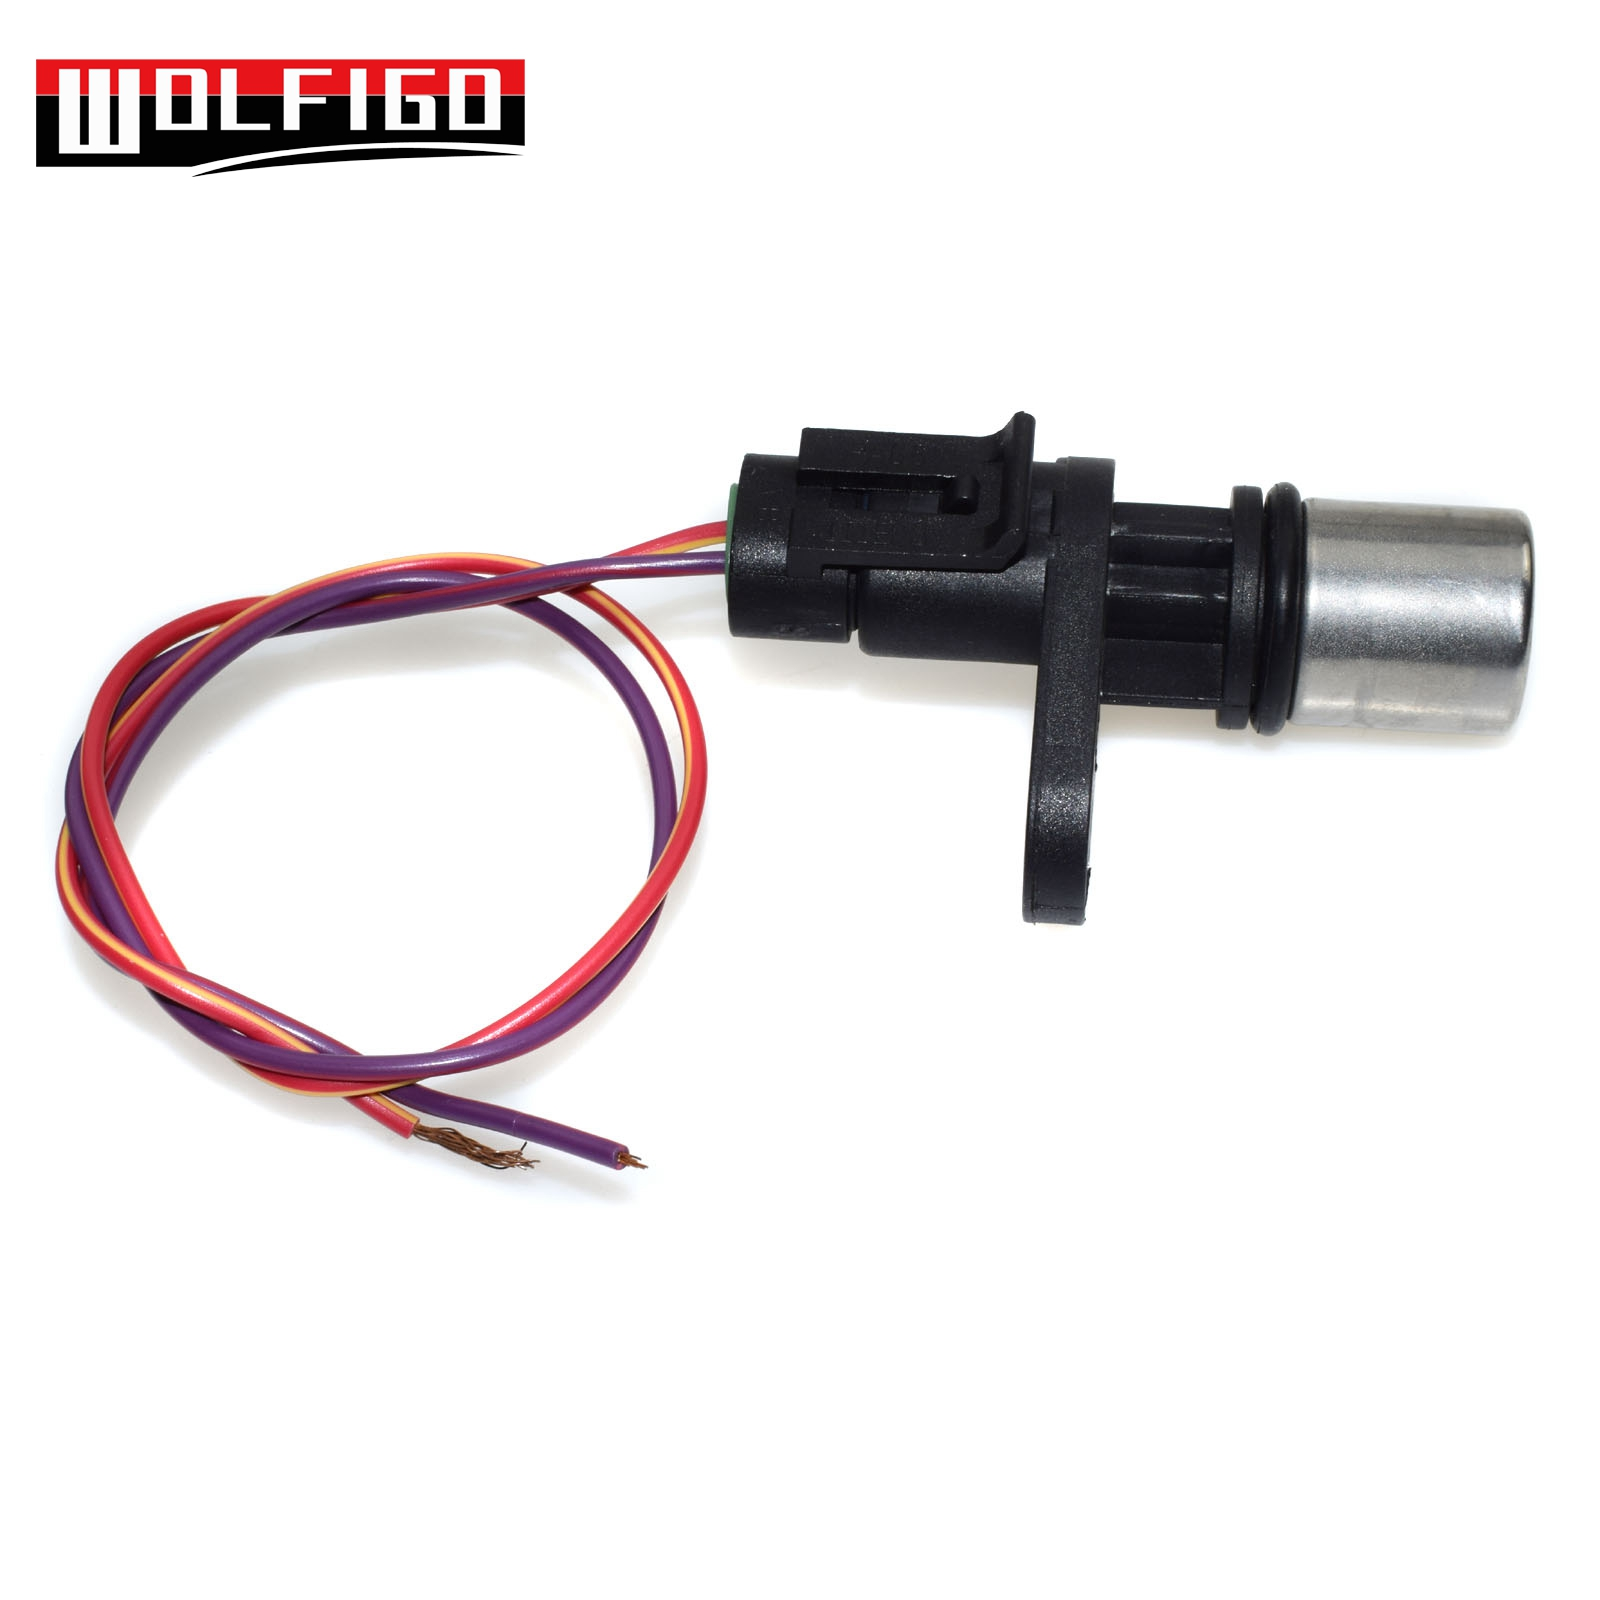 Engine Crankshaft Position Sensor W// Connector For Buick Chevrolet 213-970 New